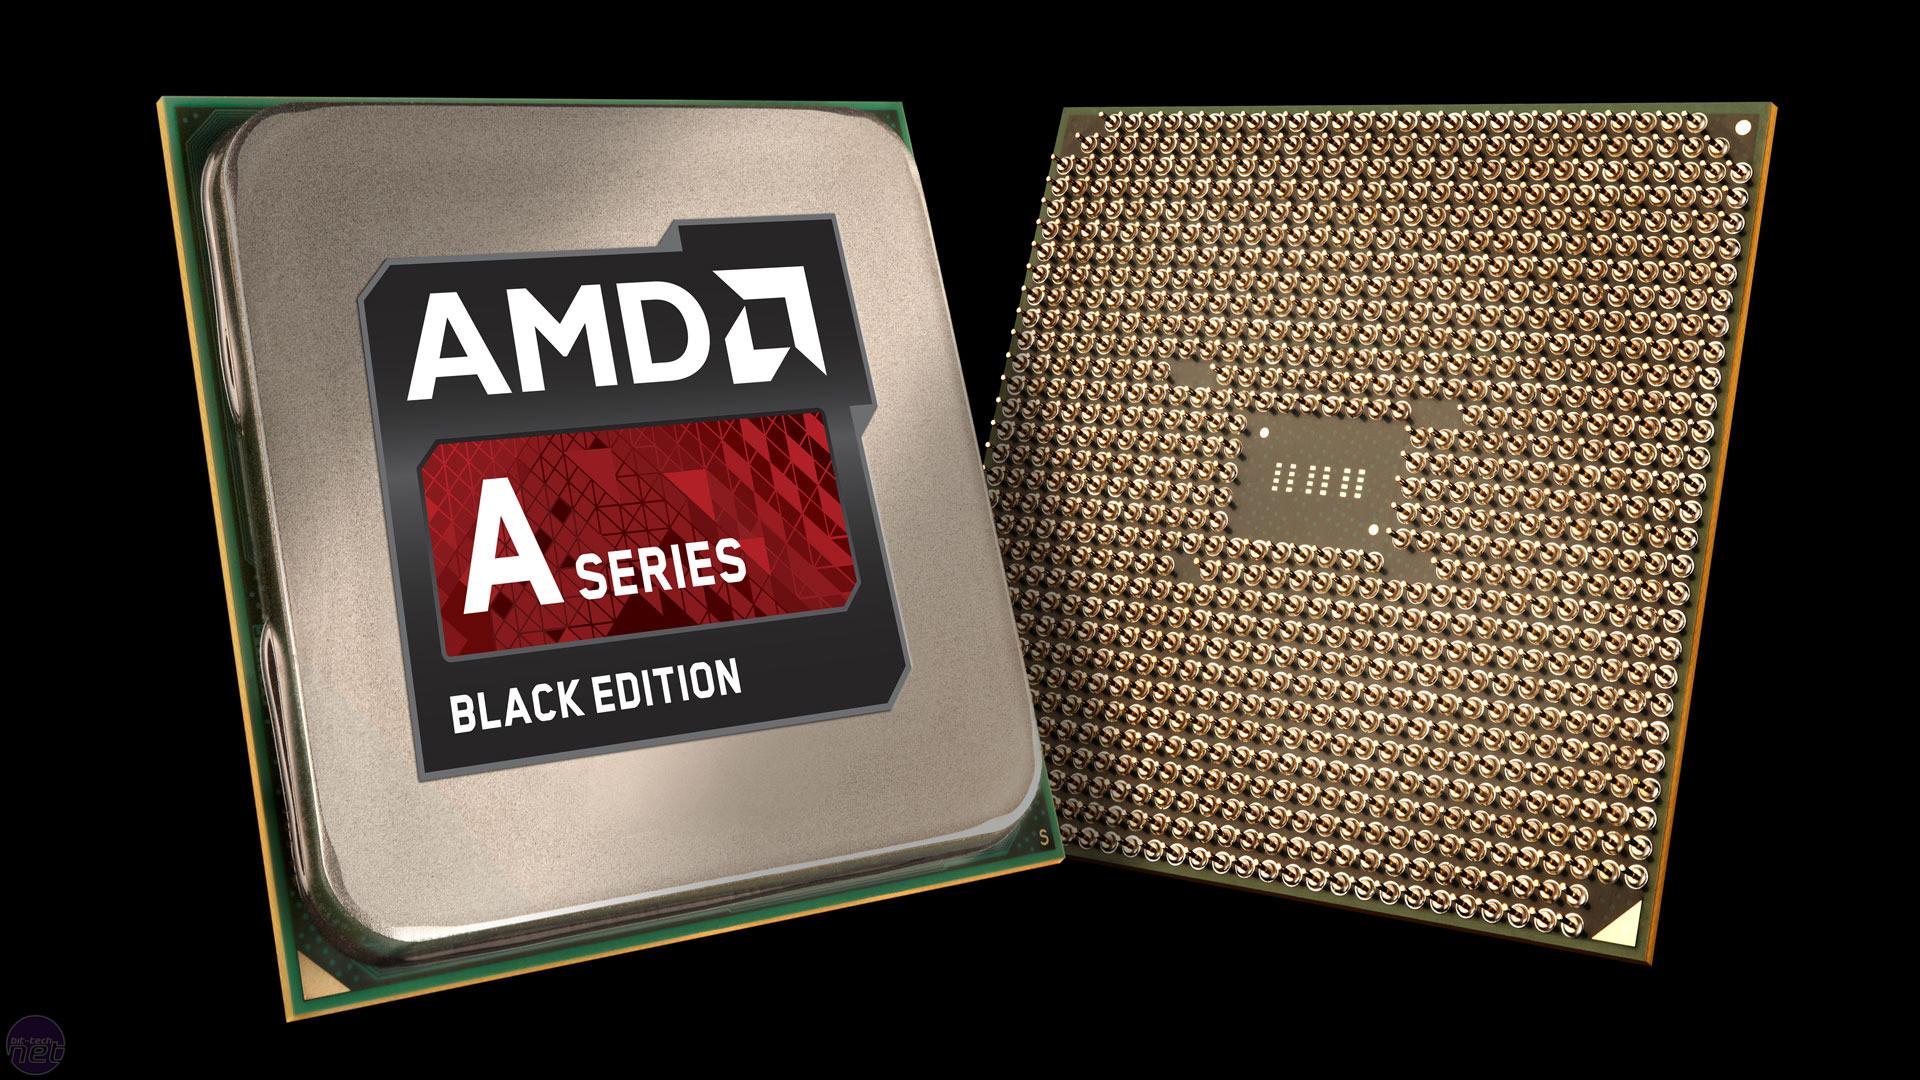 AMD's Trinity A10